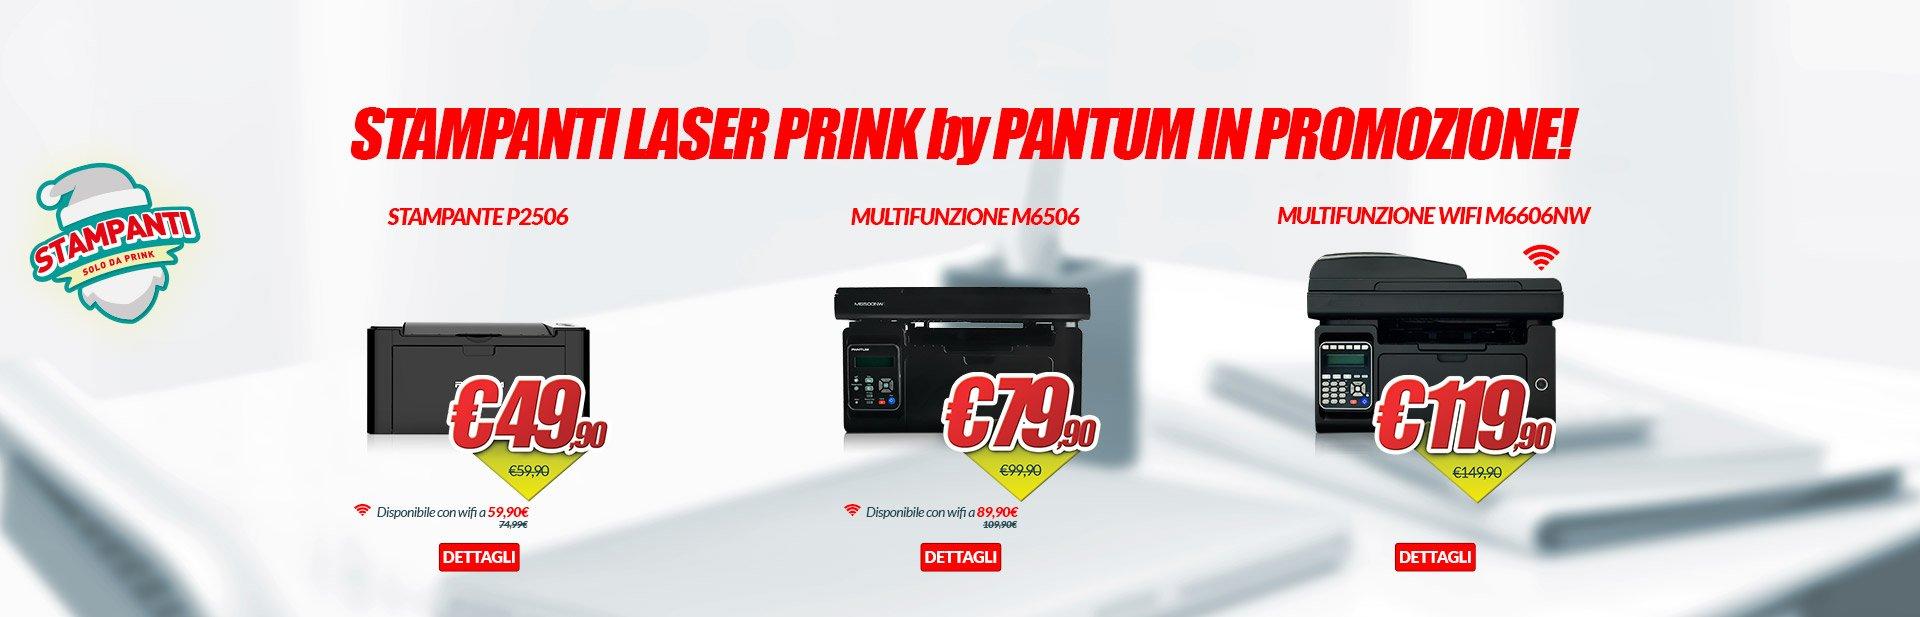 stampanti-laser-prink-by-pantum-in-promozione-natale-SL